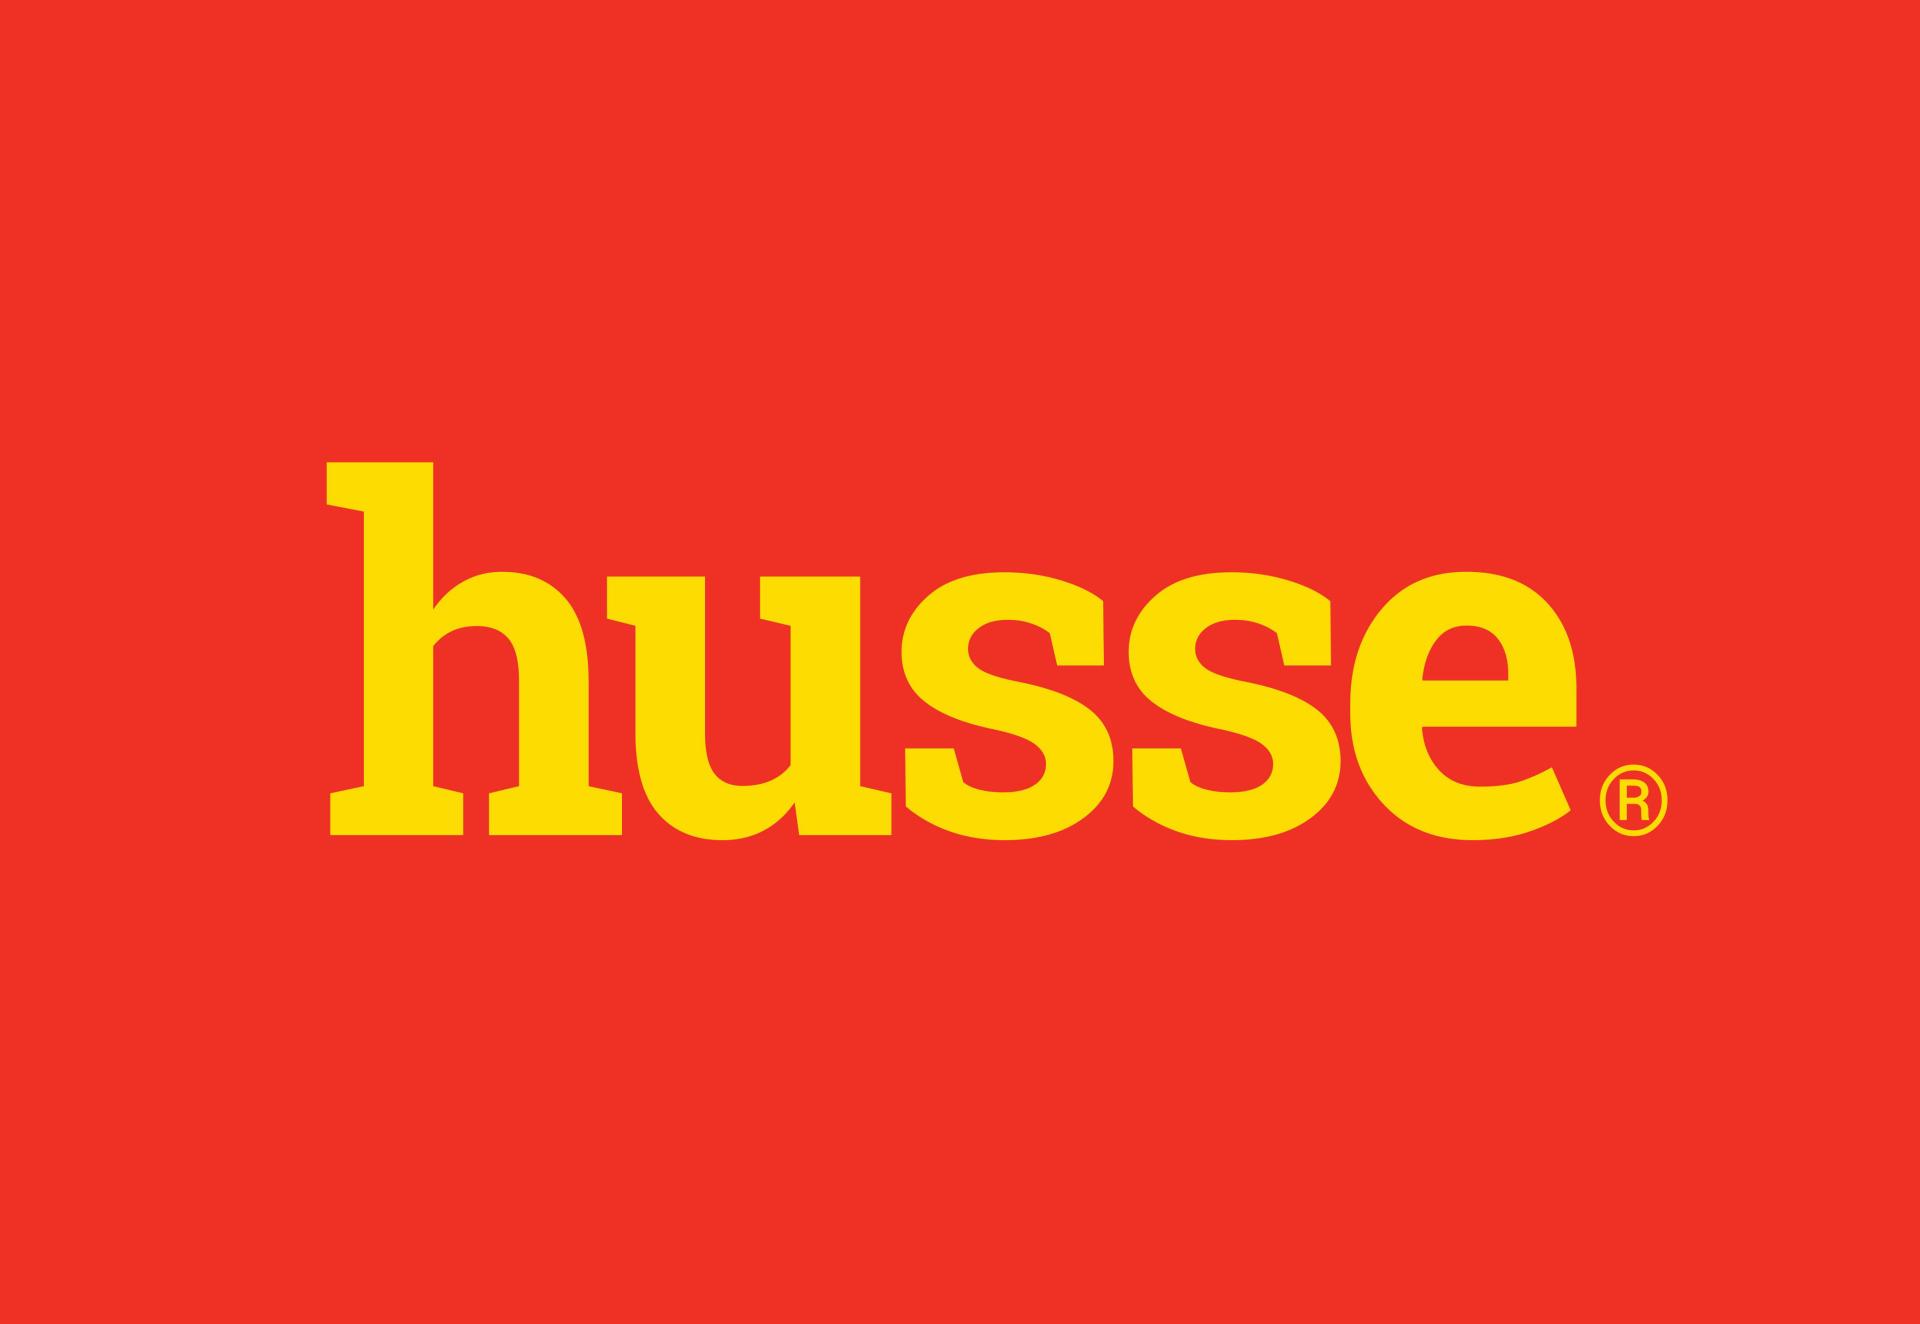 Husse®